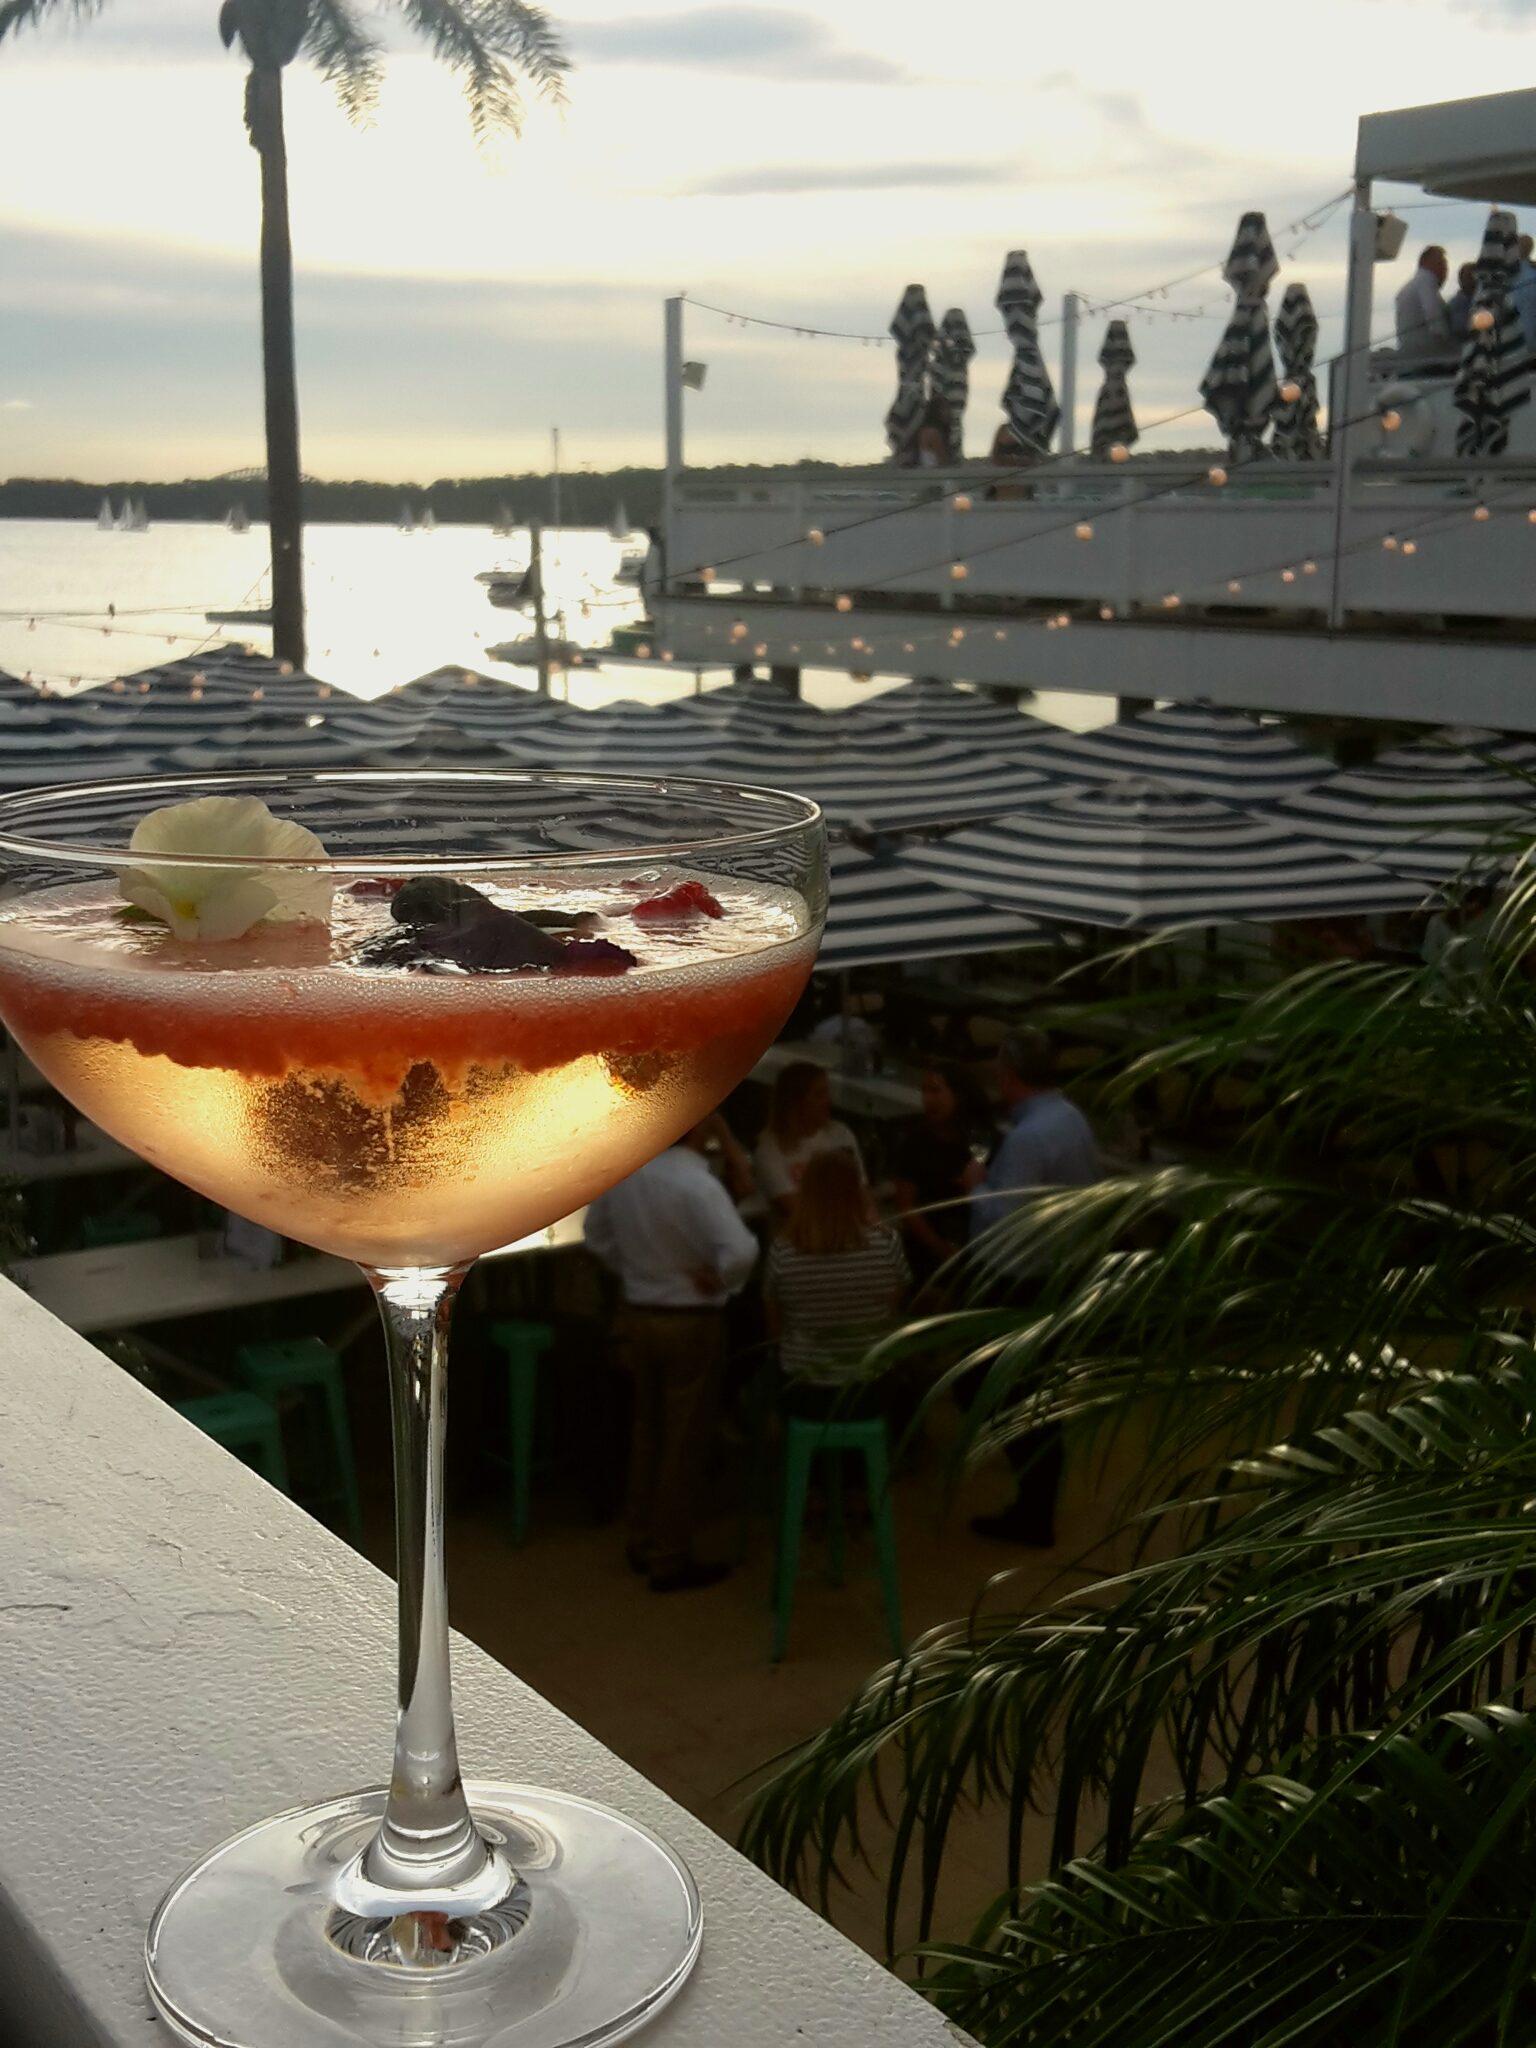 Fruity cocktail on Watsons balcony.